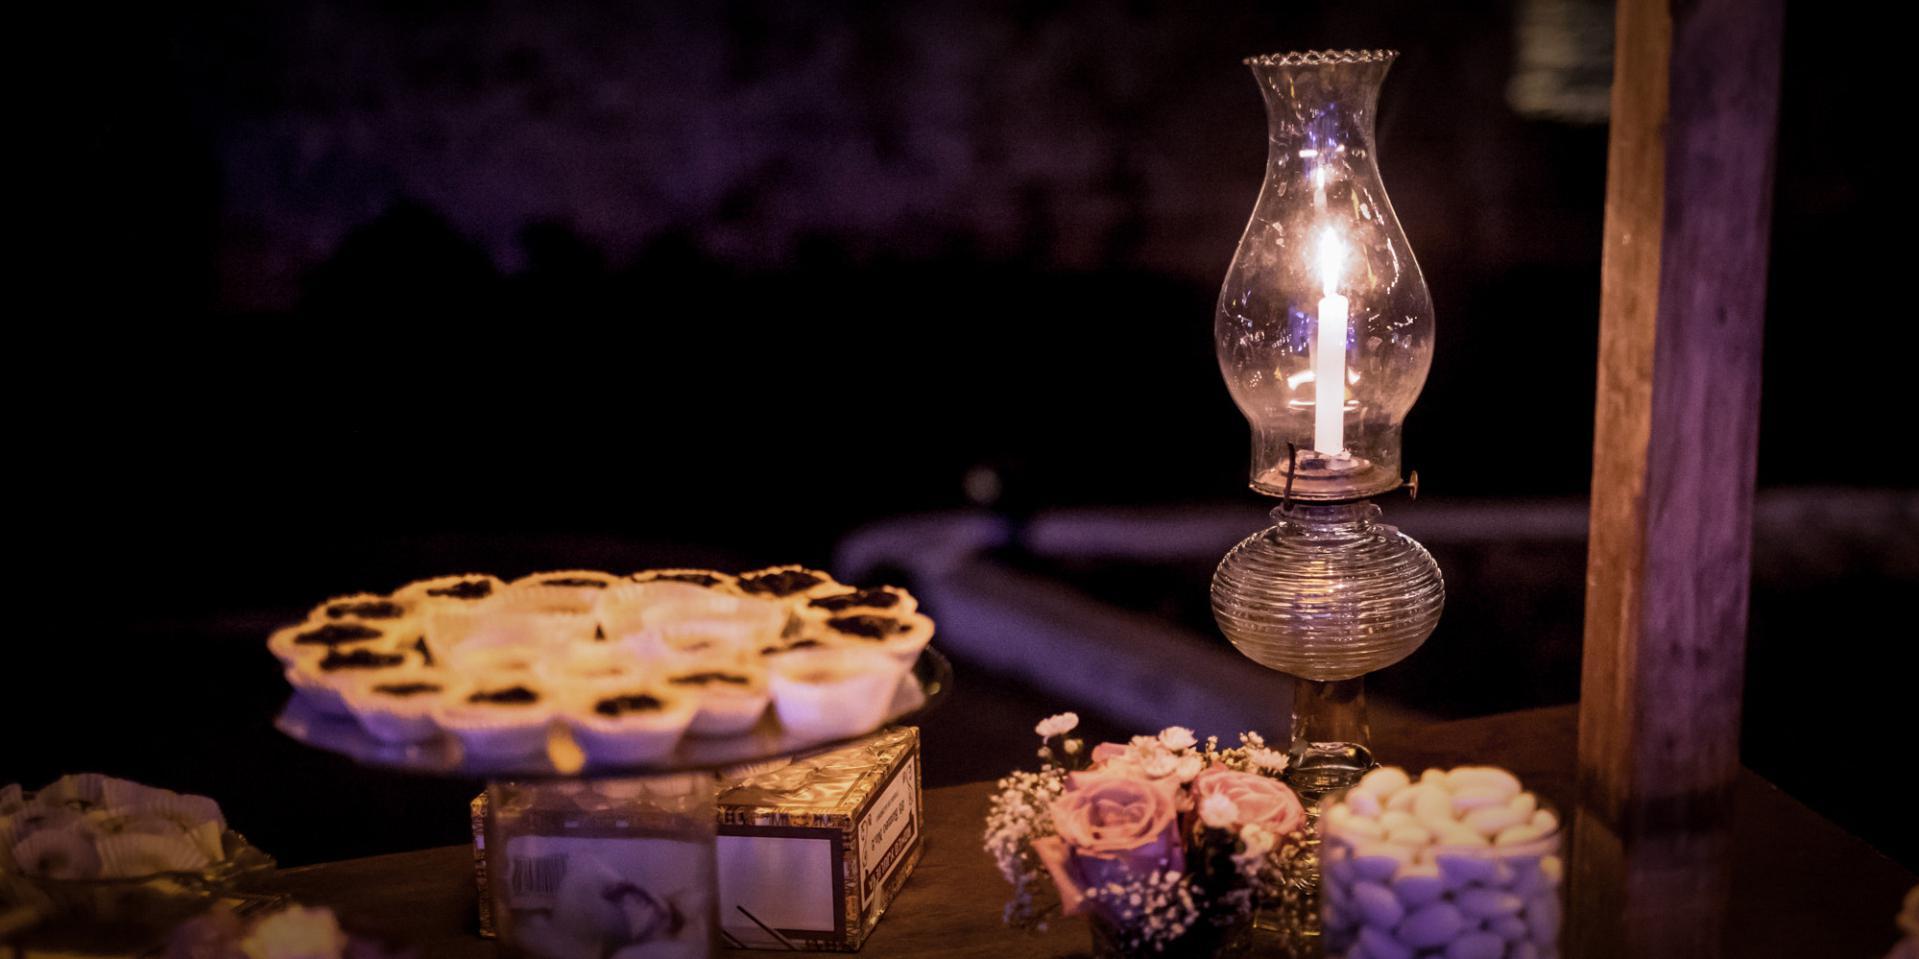 bodas-sin-clasificar-sin-tema-cuba-27811.jpg